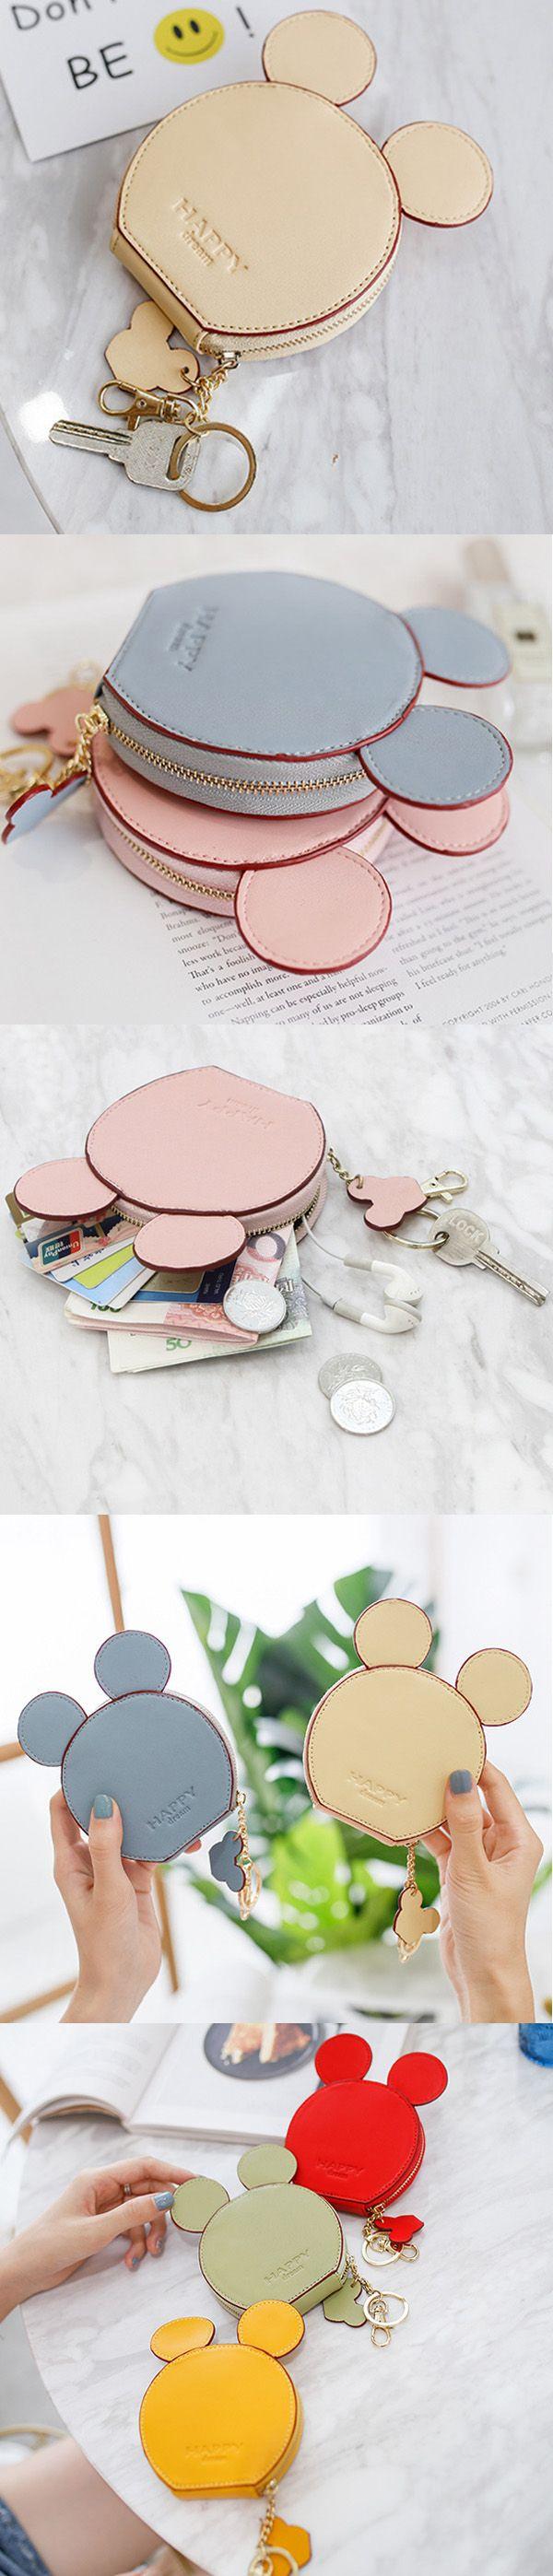 Women Cute Animal Shape Wallet Purse Coin Bag Key Bag